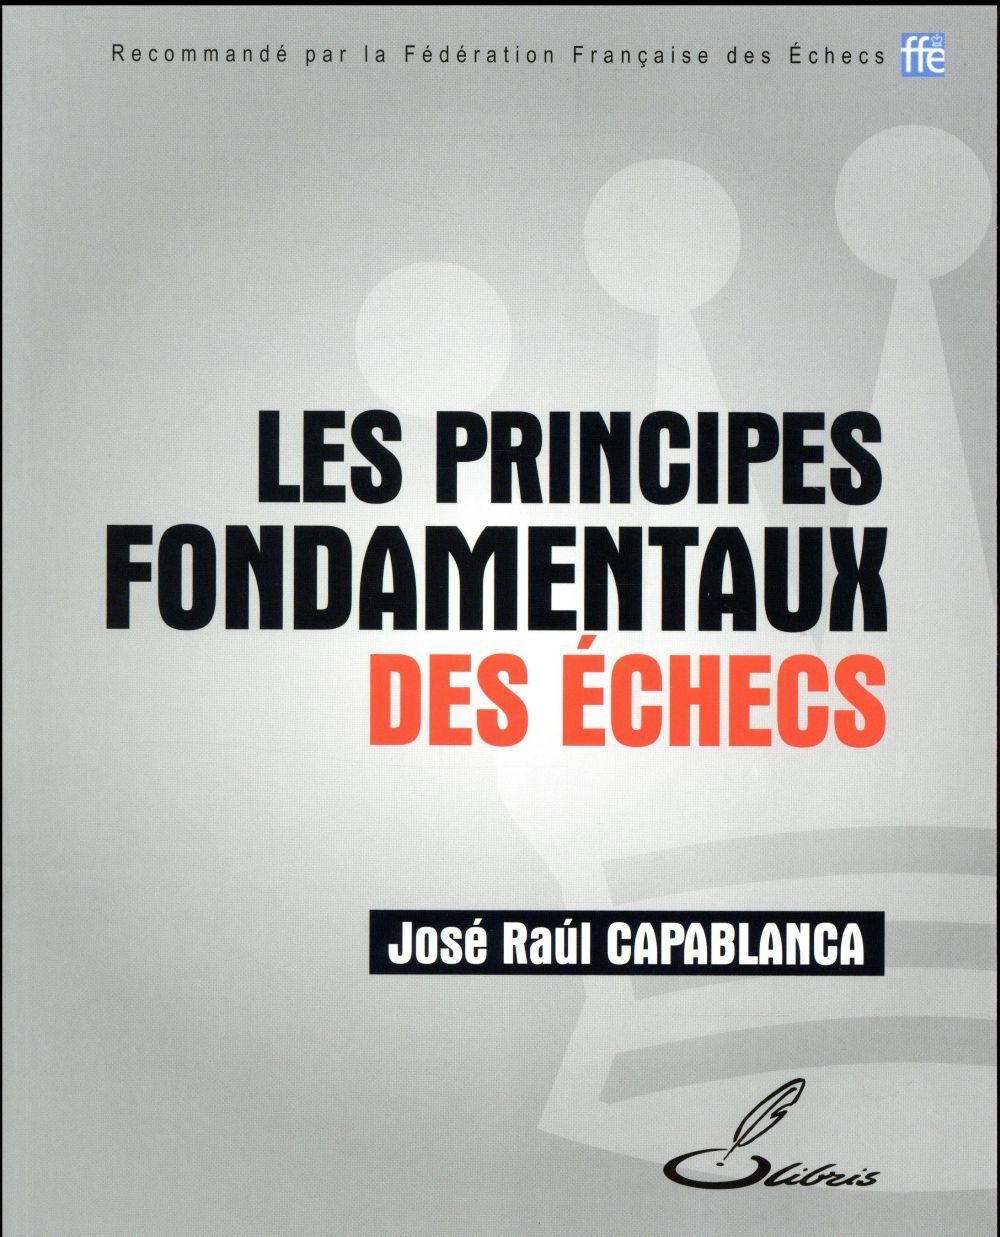 LES PRINCIPES FONDAMENTAUX DES ECHECS Capablanca J.R. Olibris